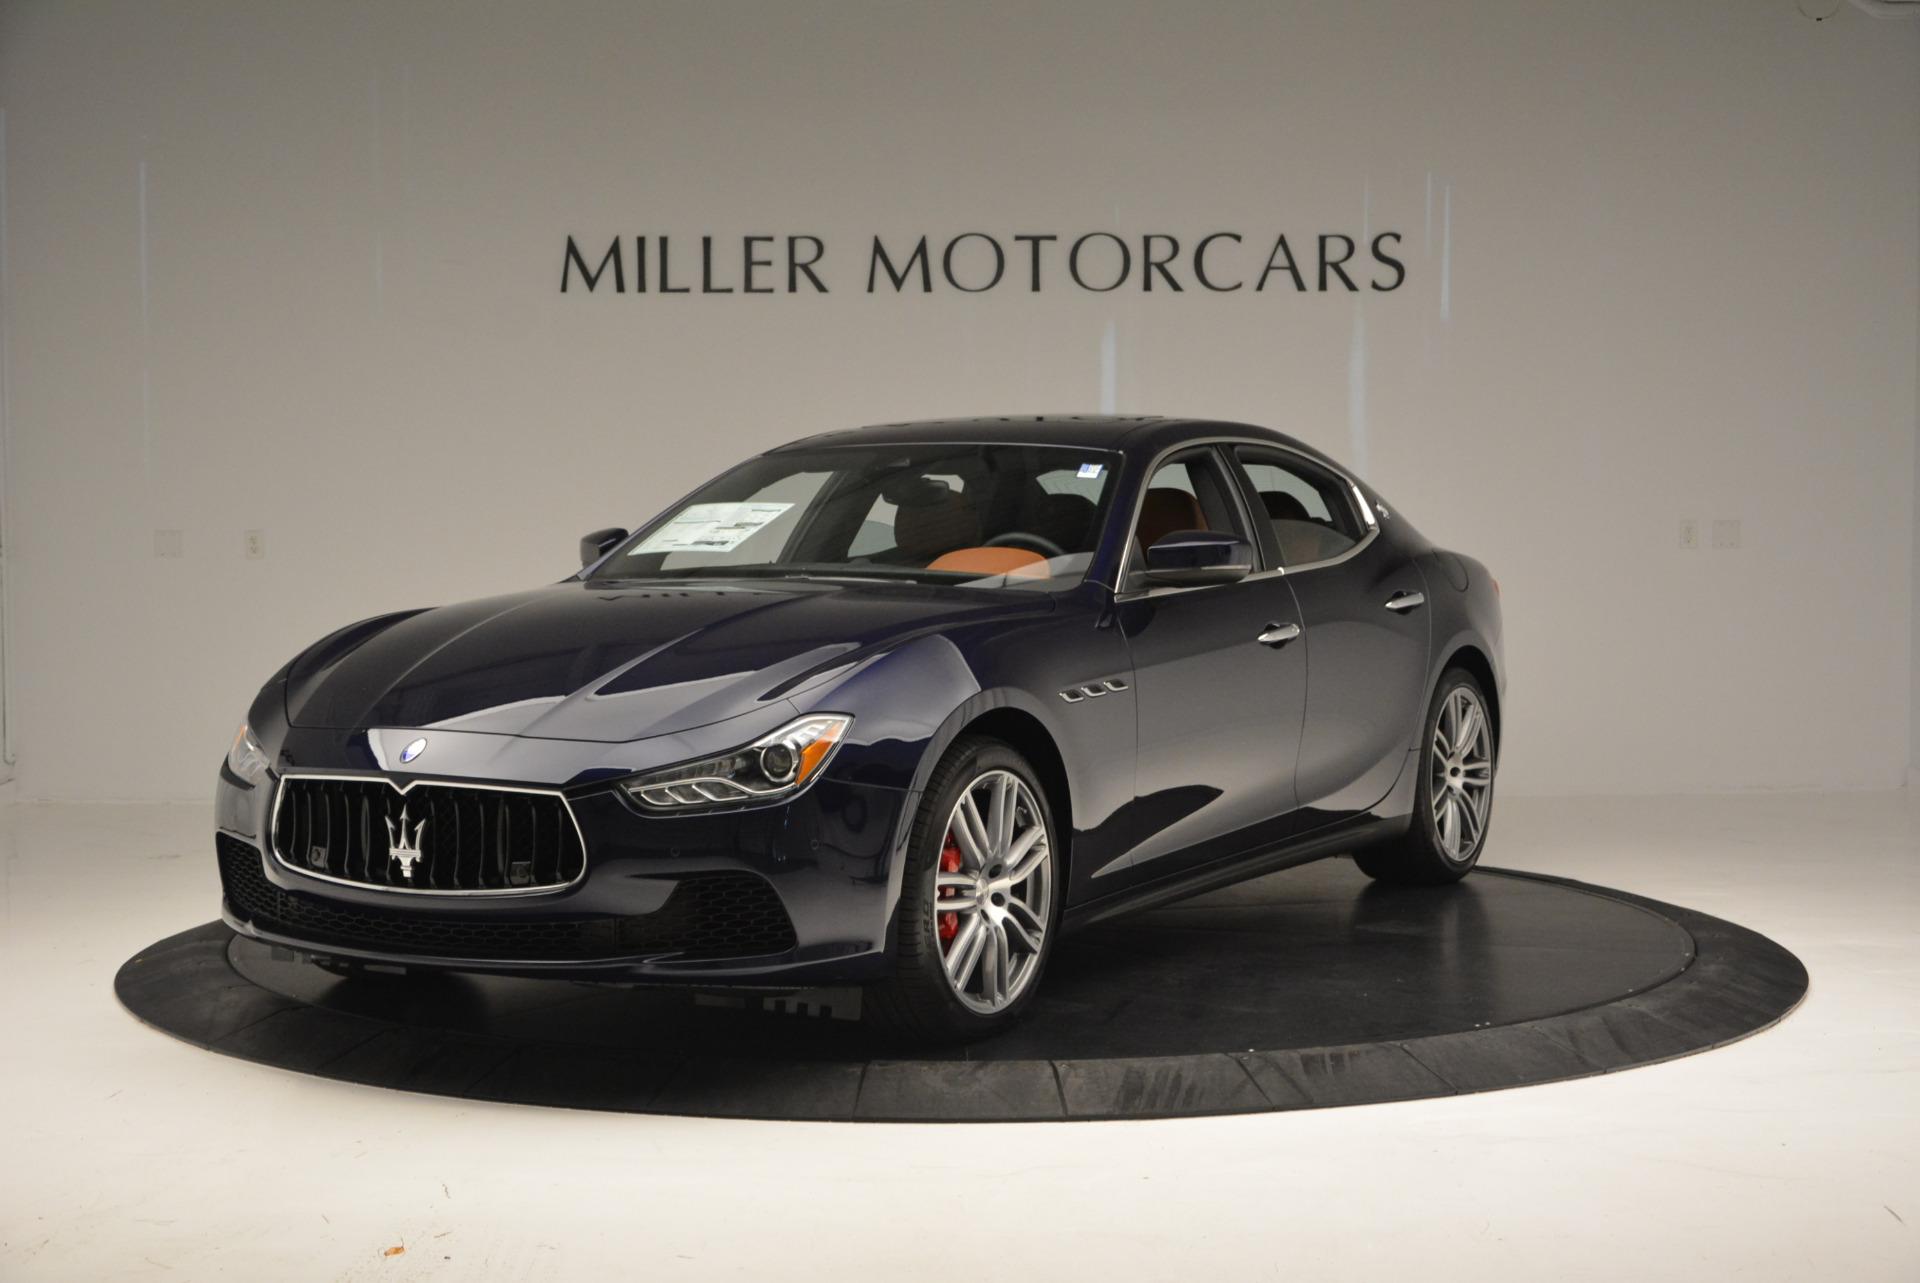 New 2017 Maserati Ghibli S Q4 For Sale In Greenwich, CT 571_main